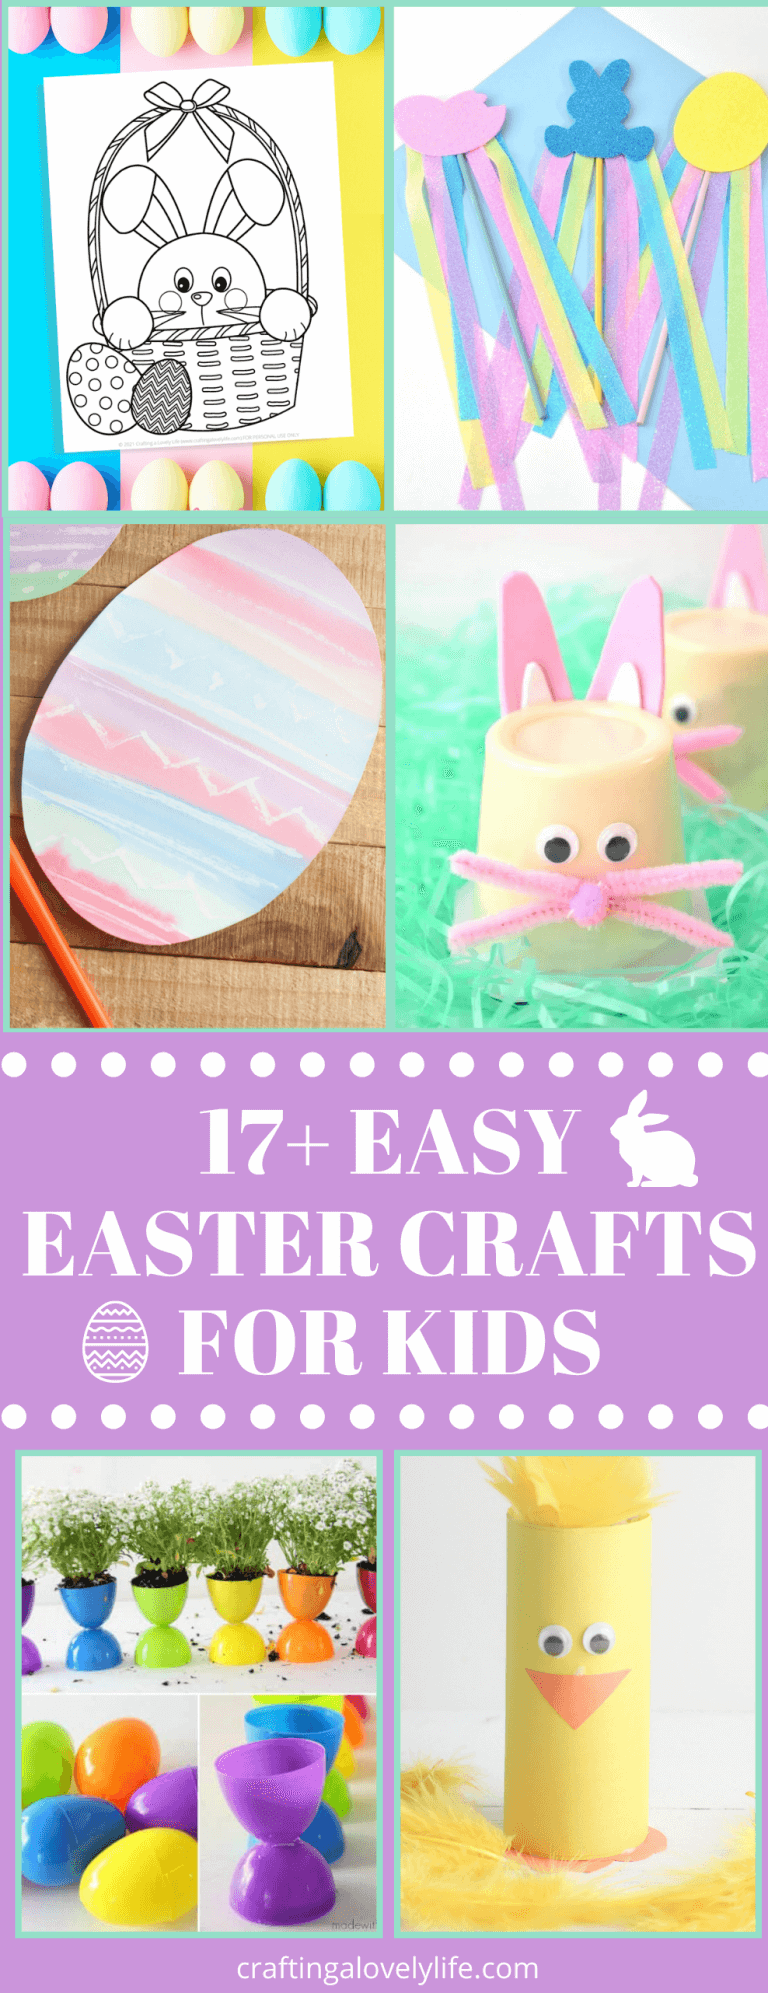 17+ Easy Easter Crafts for Kids